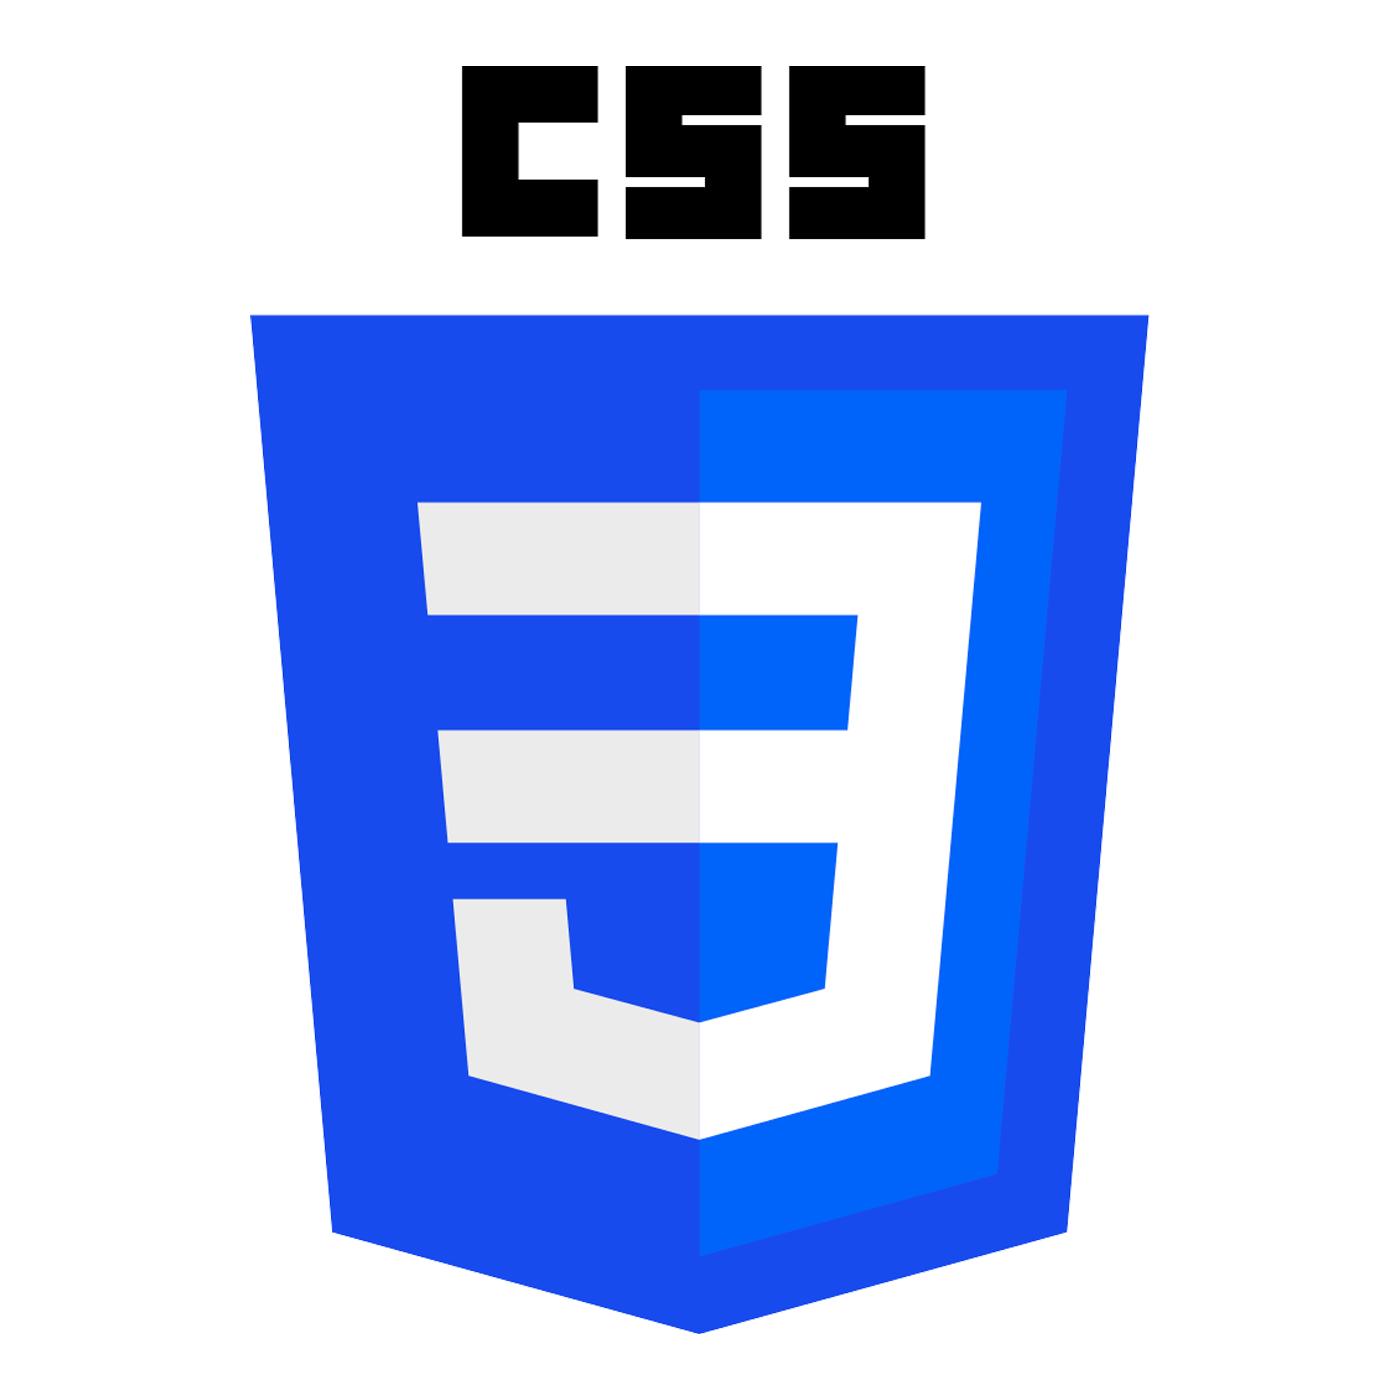 The CSS3 Logo